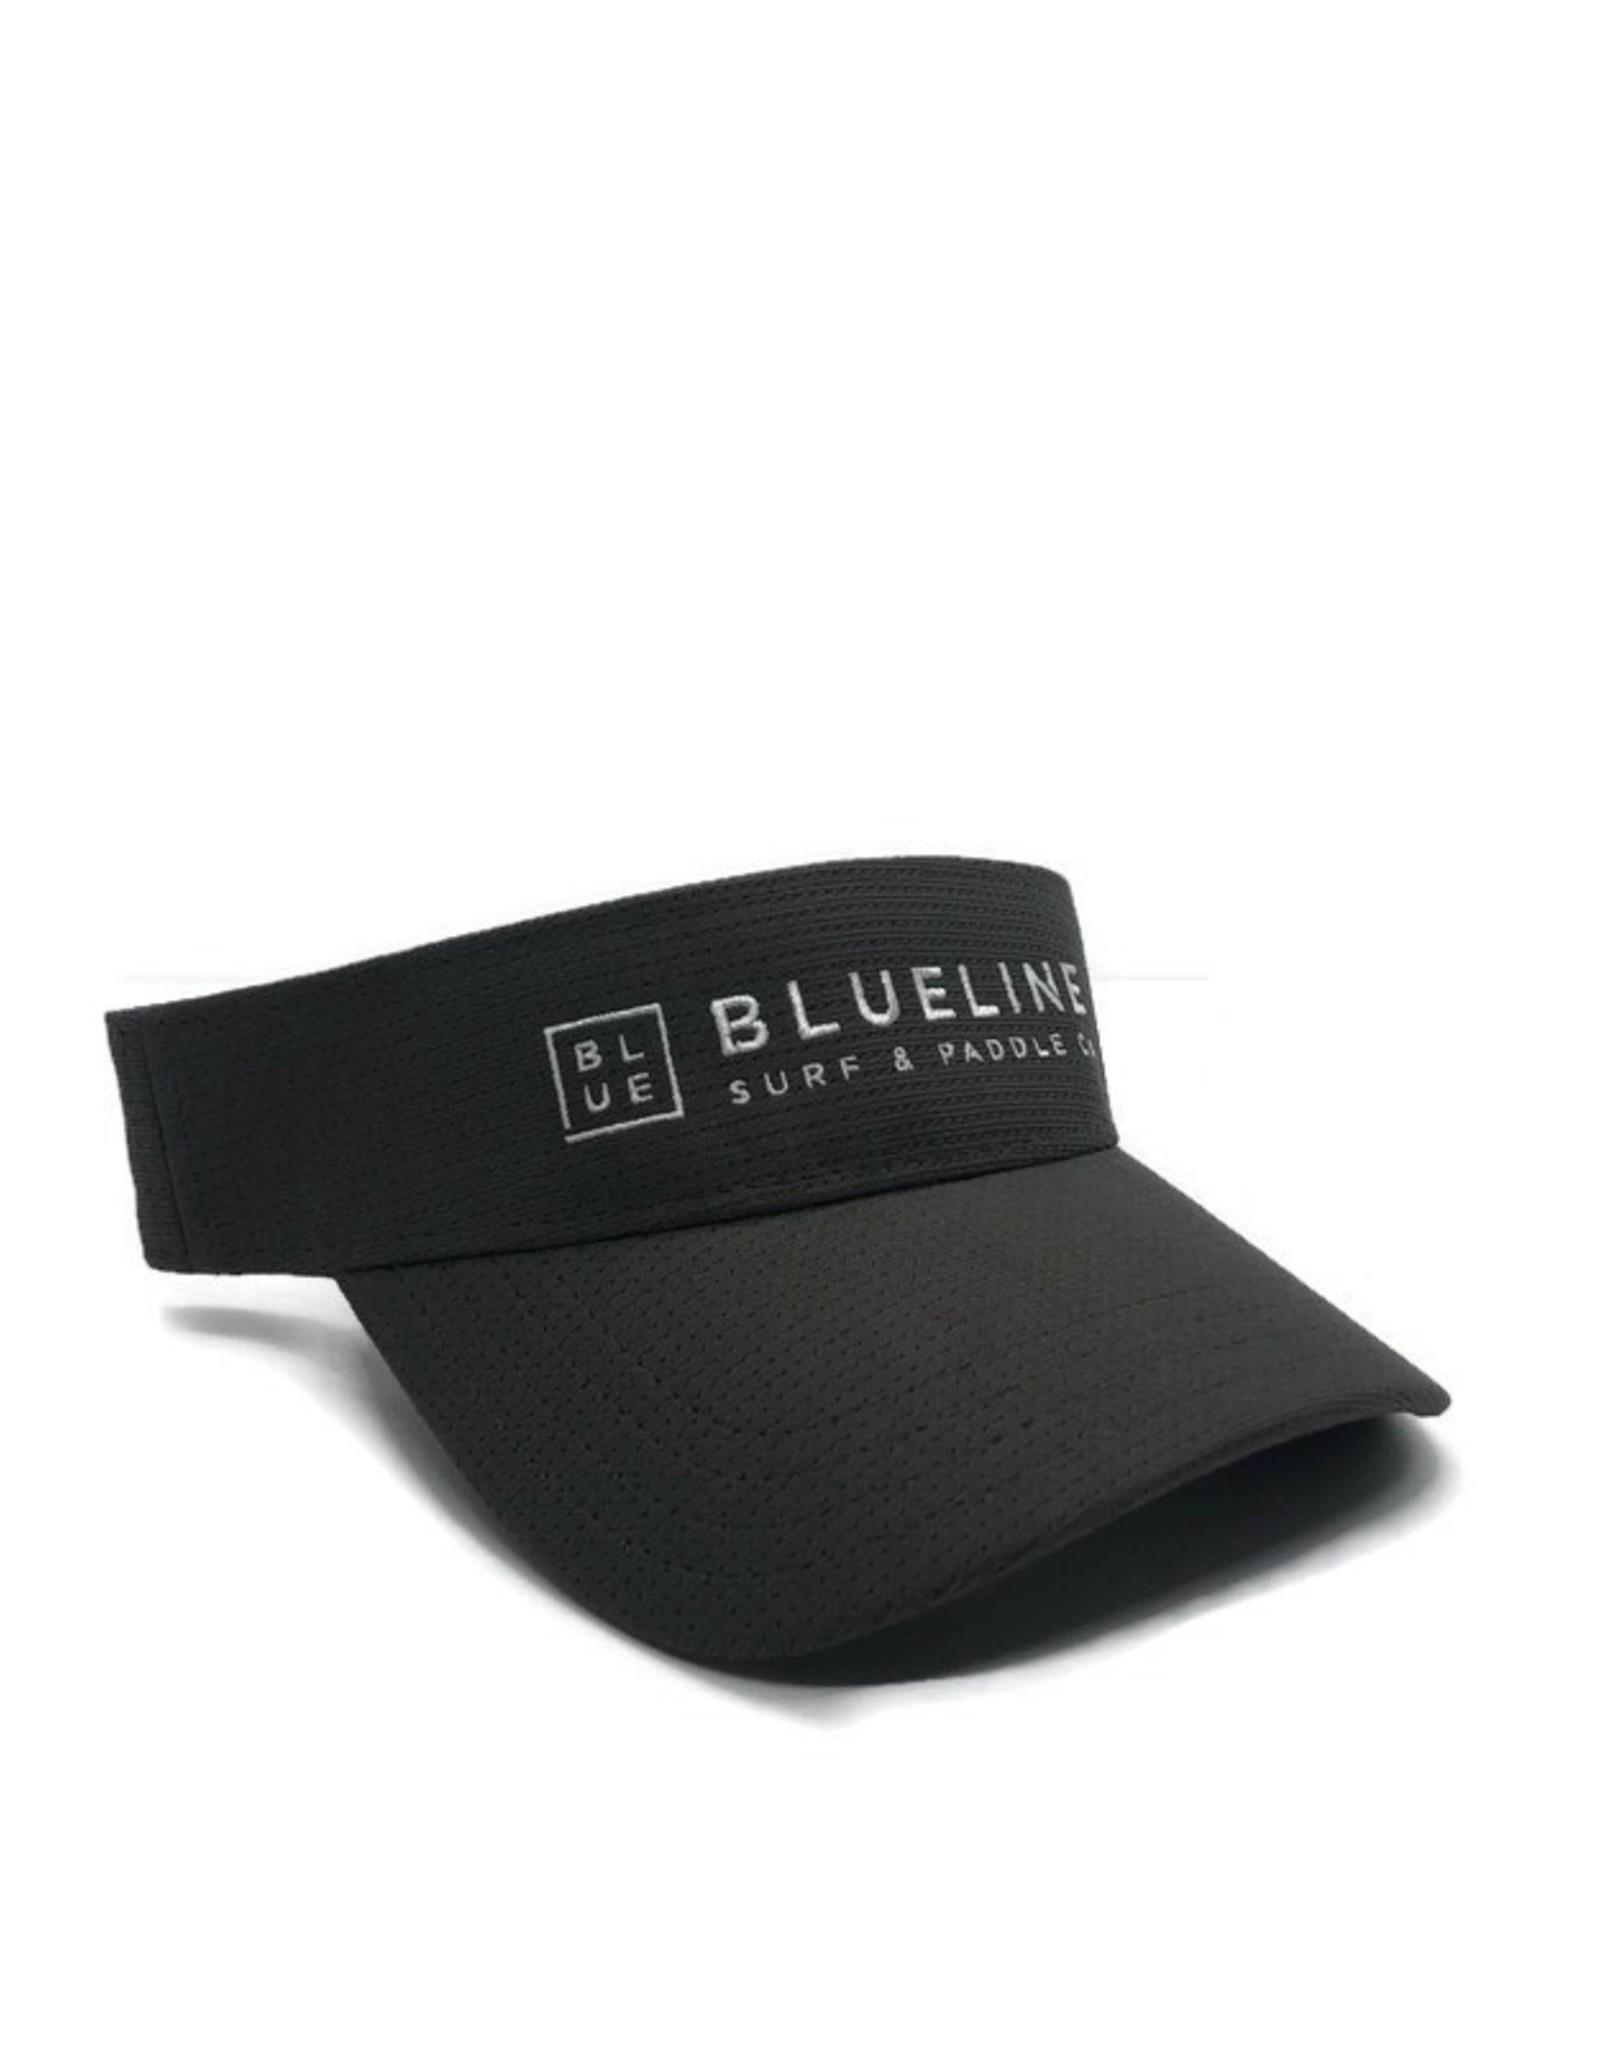 Blueline Surf + Paddle Co. Blueline UV Lite Visor Charcoal